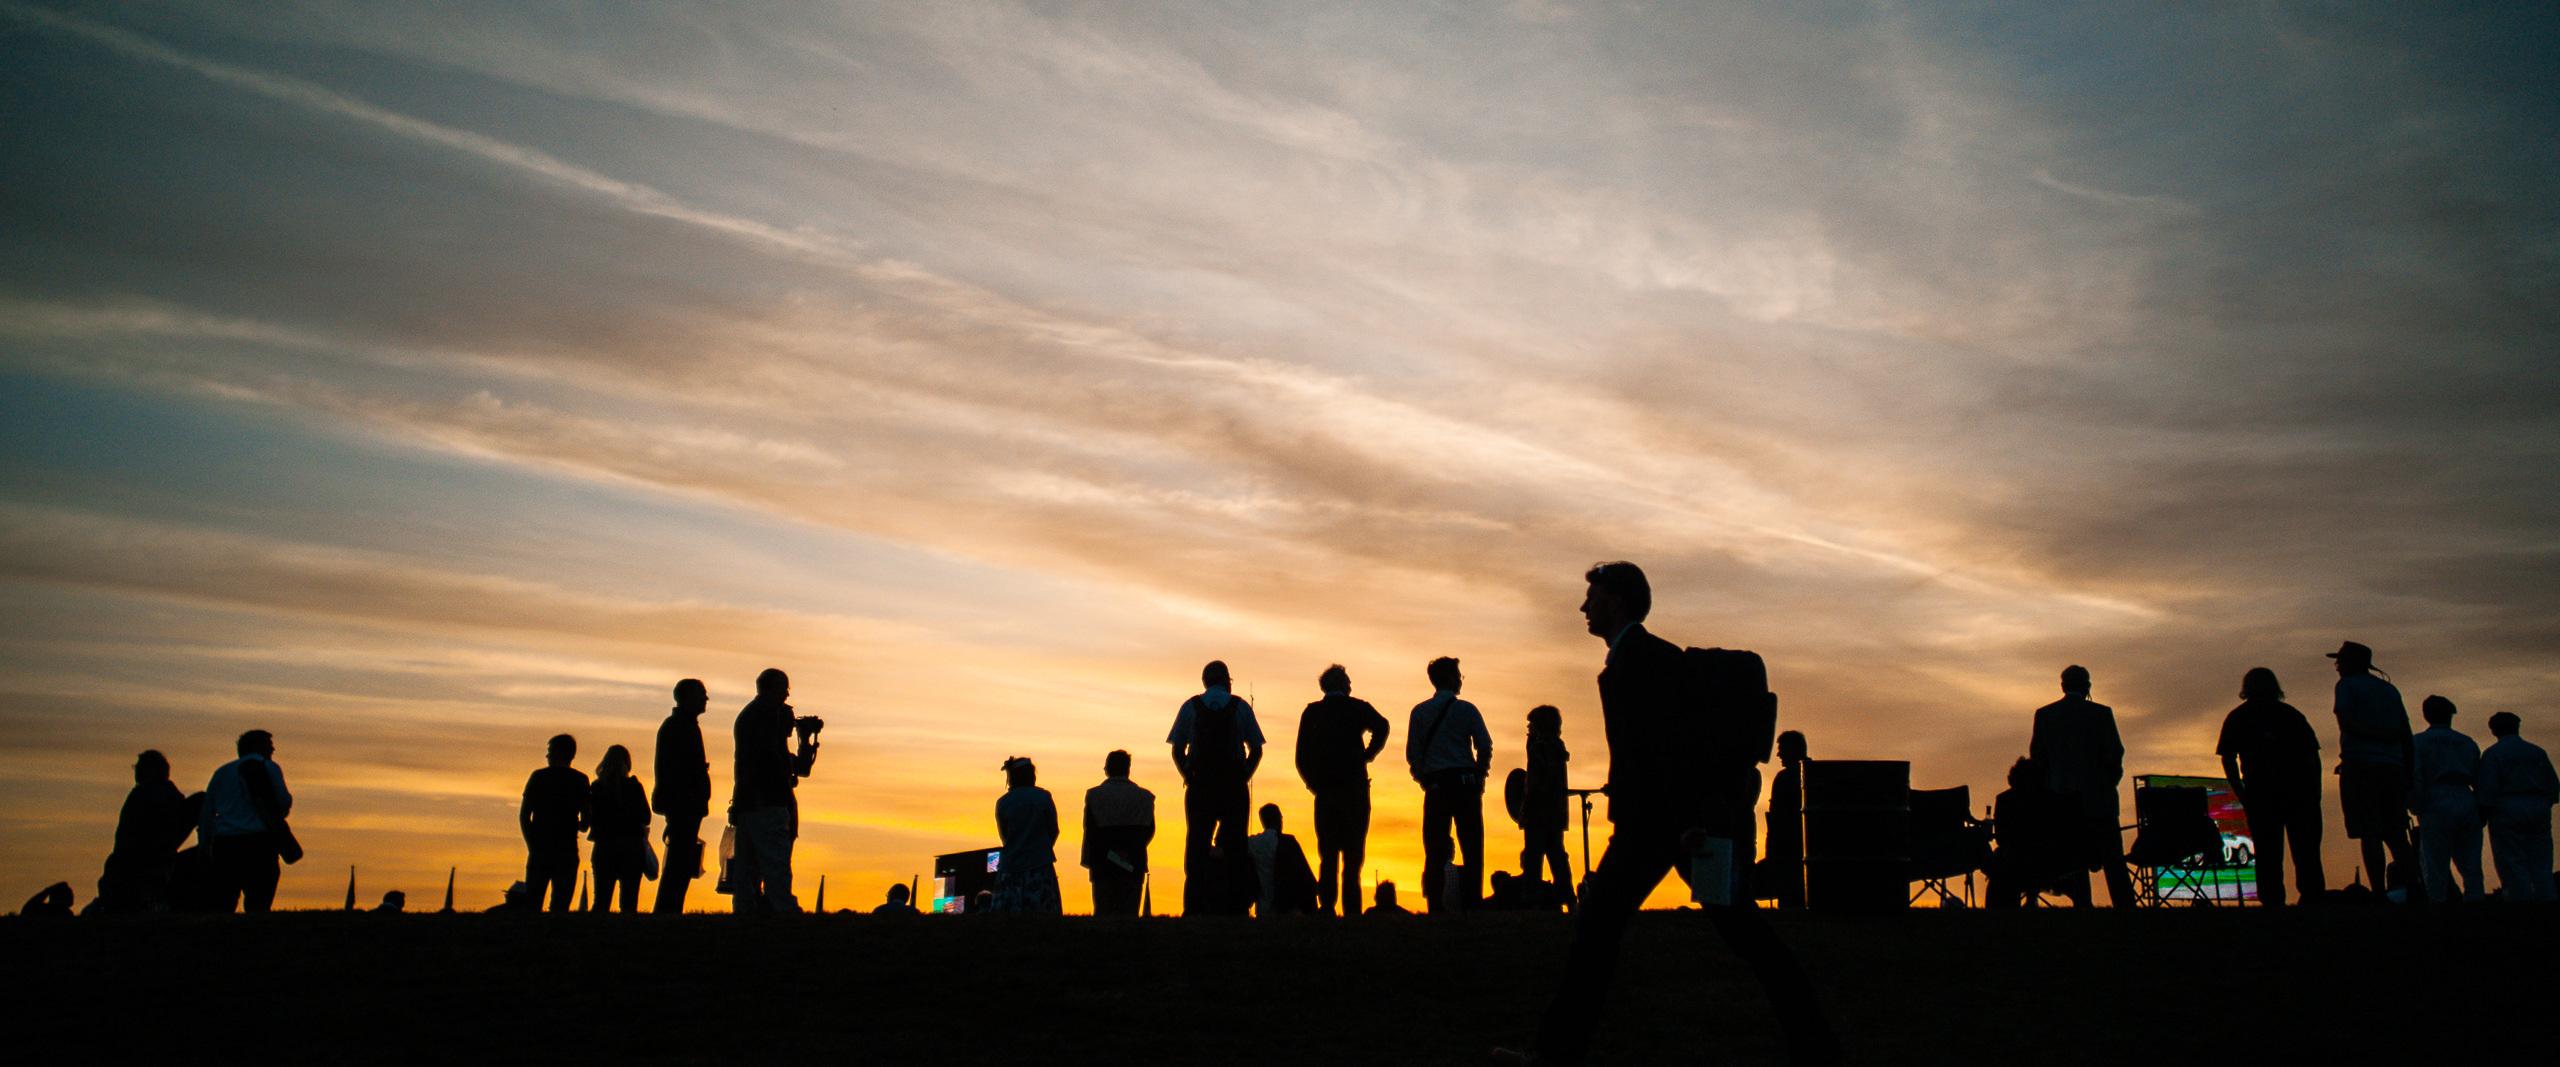 Wayfinder Workshop Goodwood Revival Sunset Crowd By Brett Leica Photographer